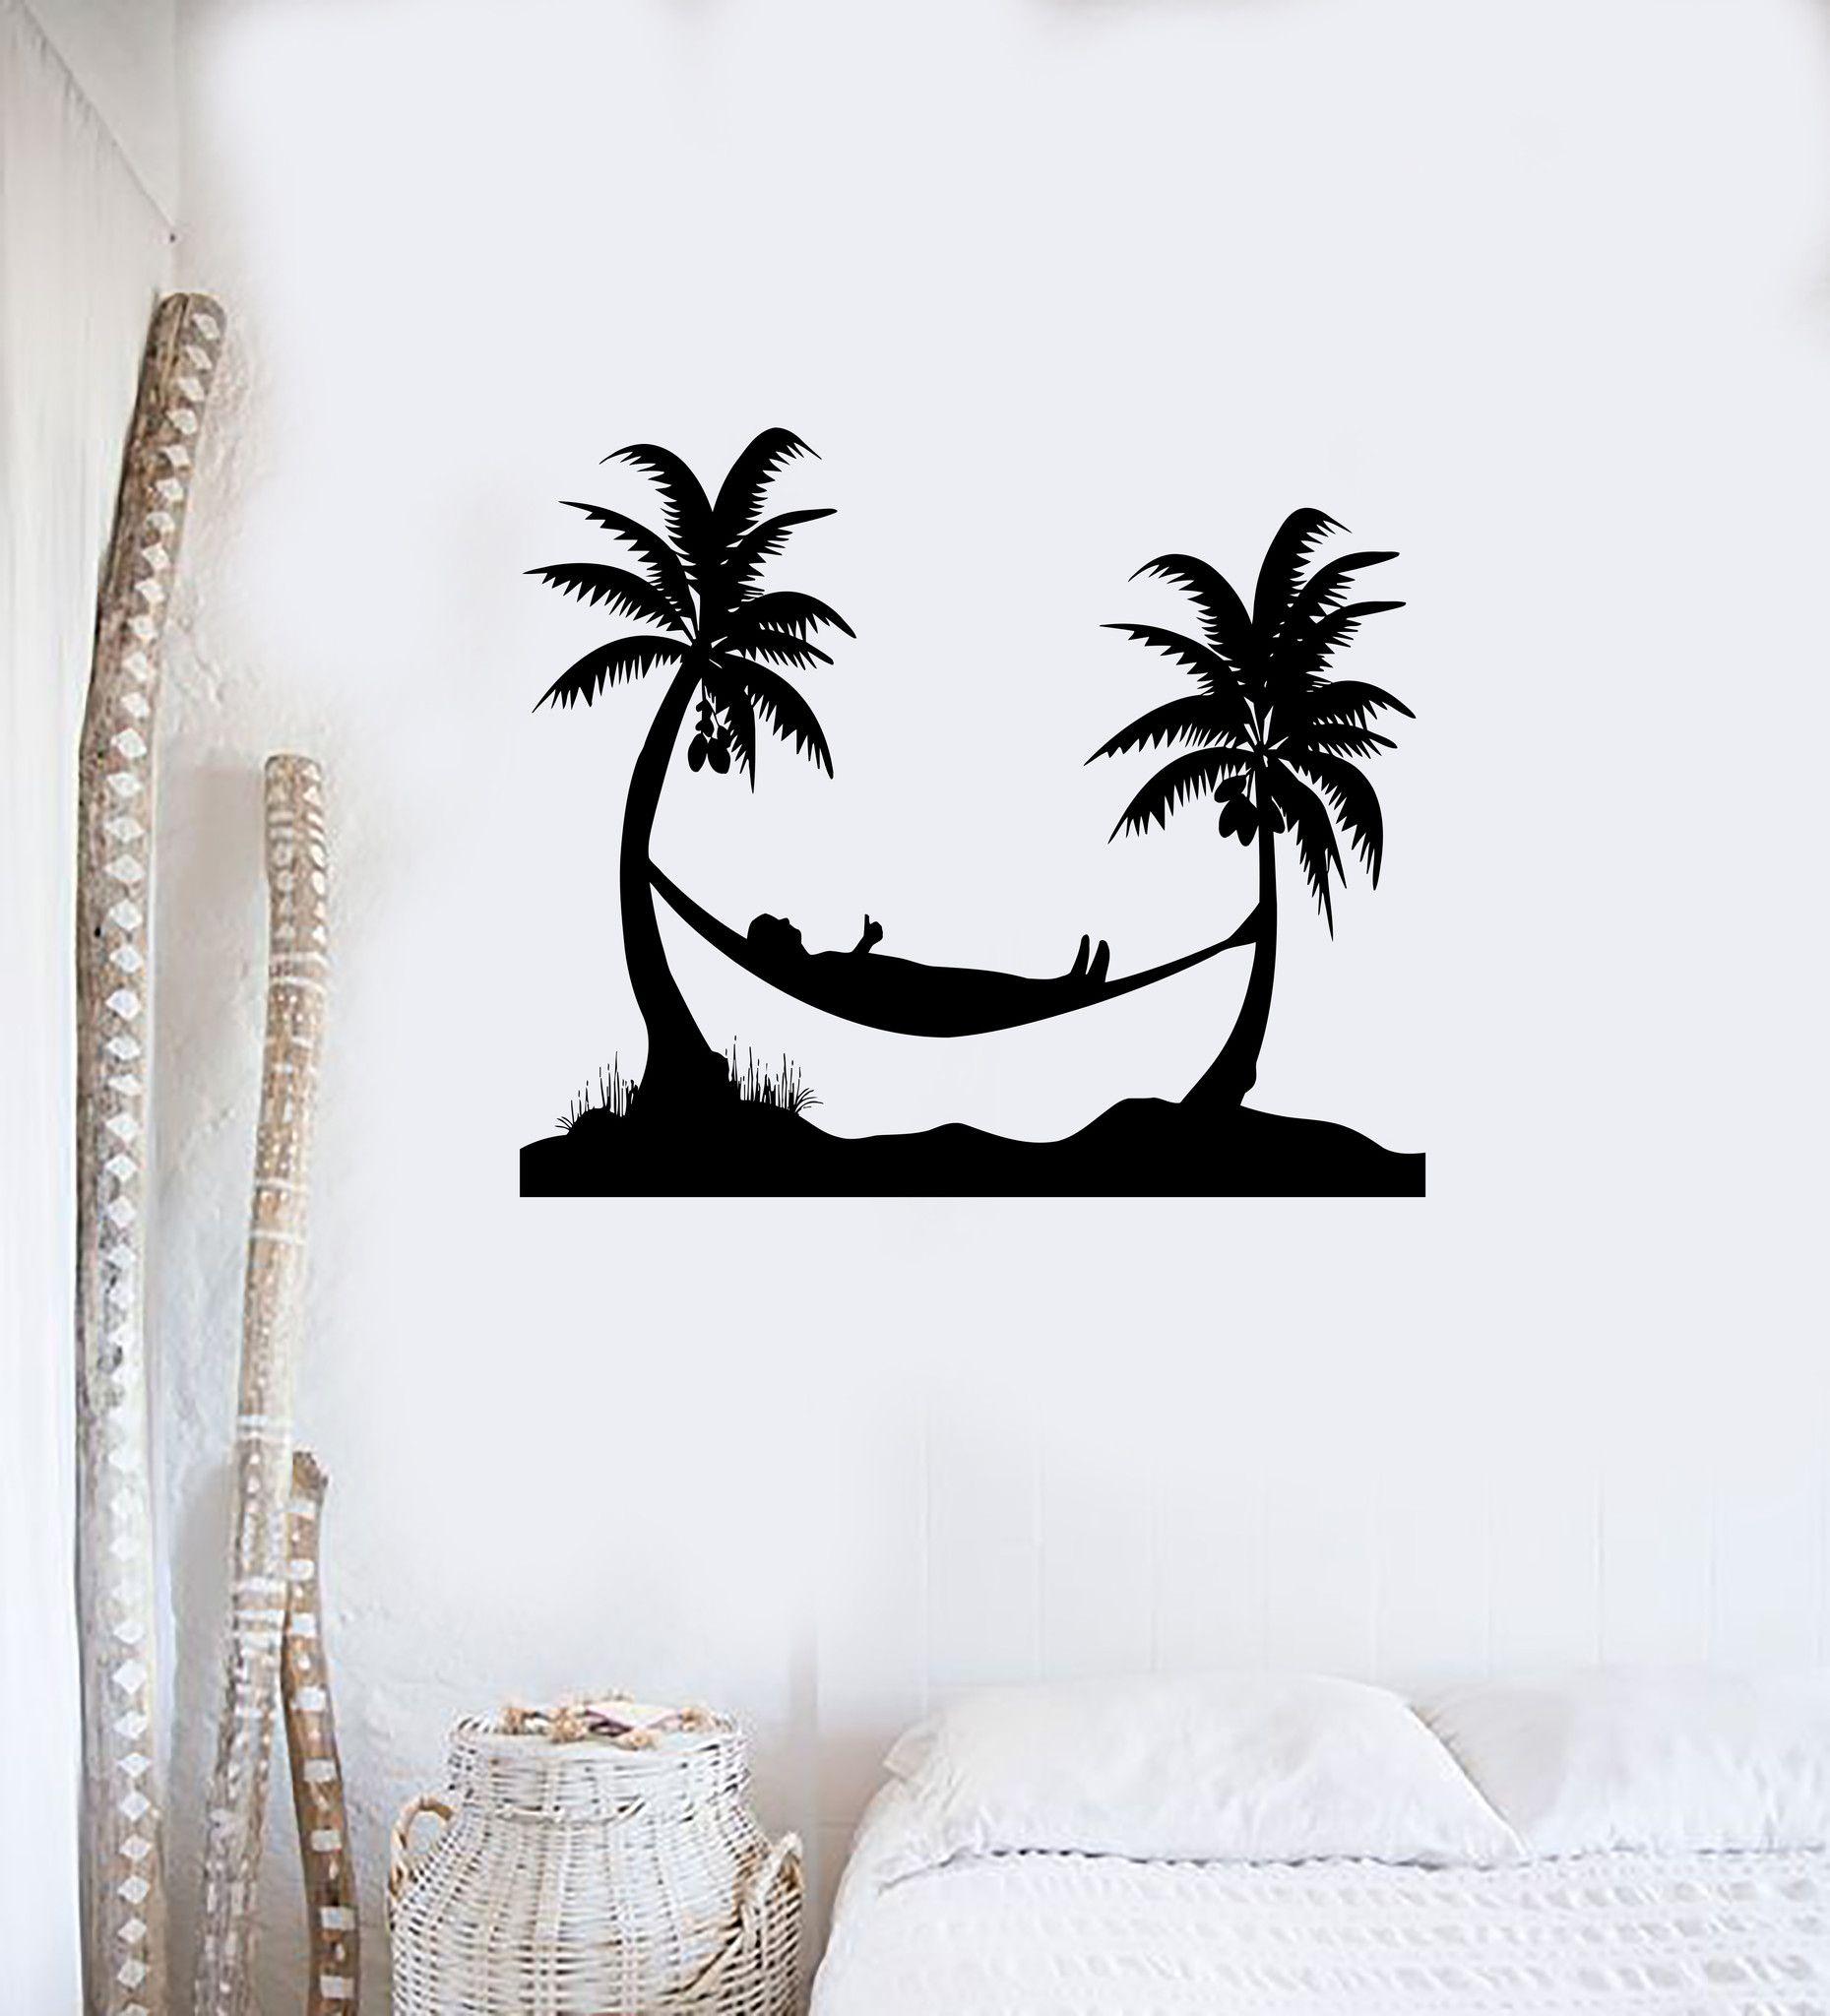 Wall Sticker Vinyl Decal Palm Beach Tropical Relax Hammock ig1859